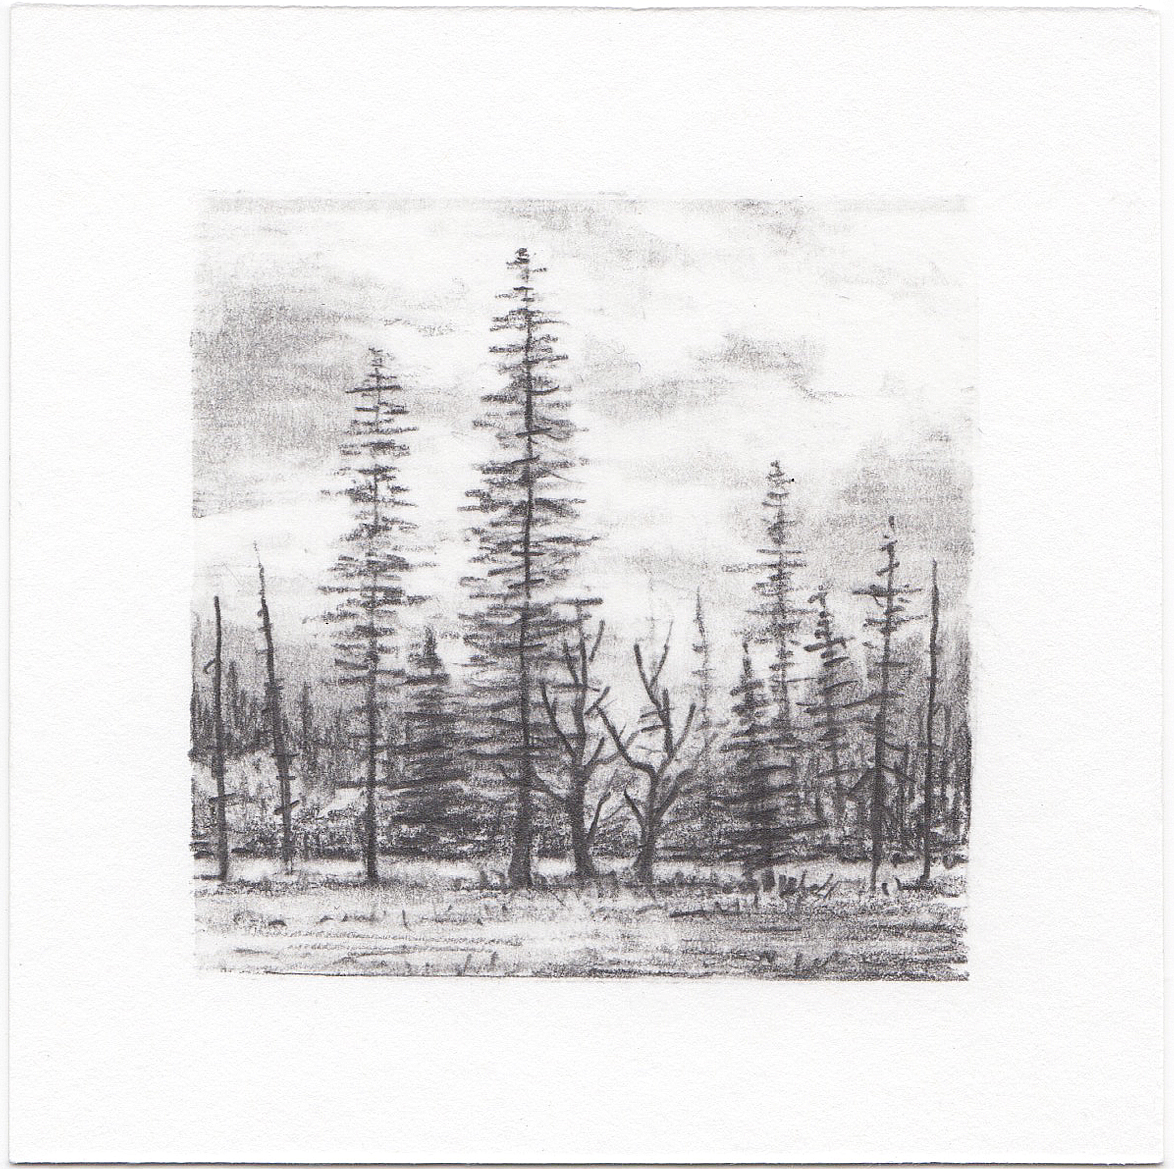 #65 Yosemite National Park, California | 3x3 | graphite